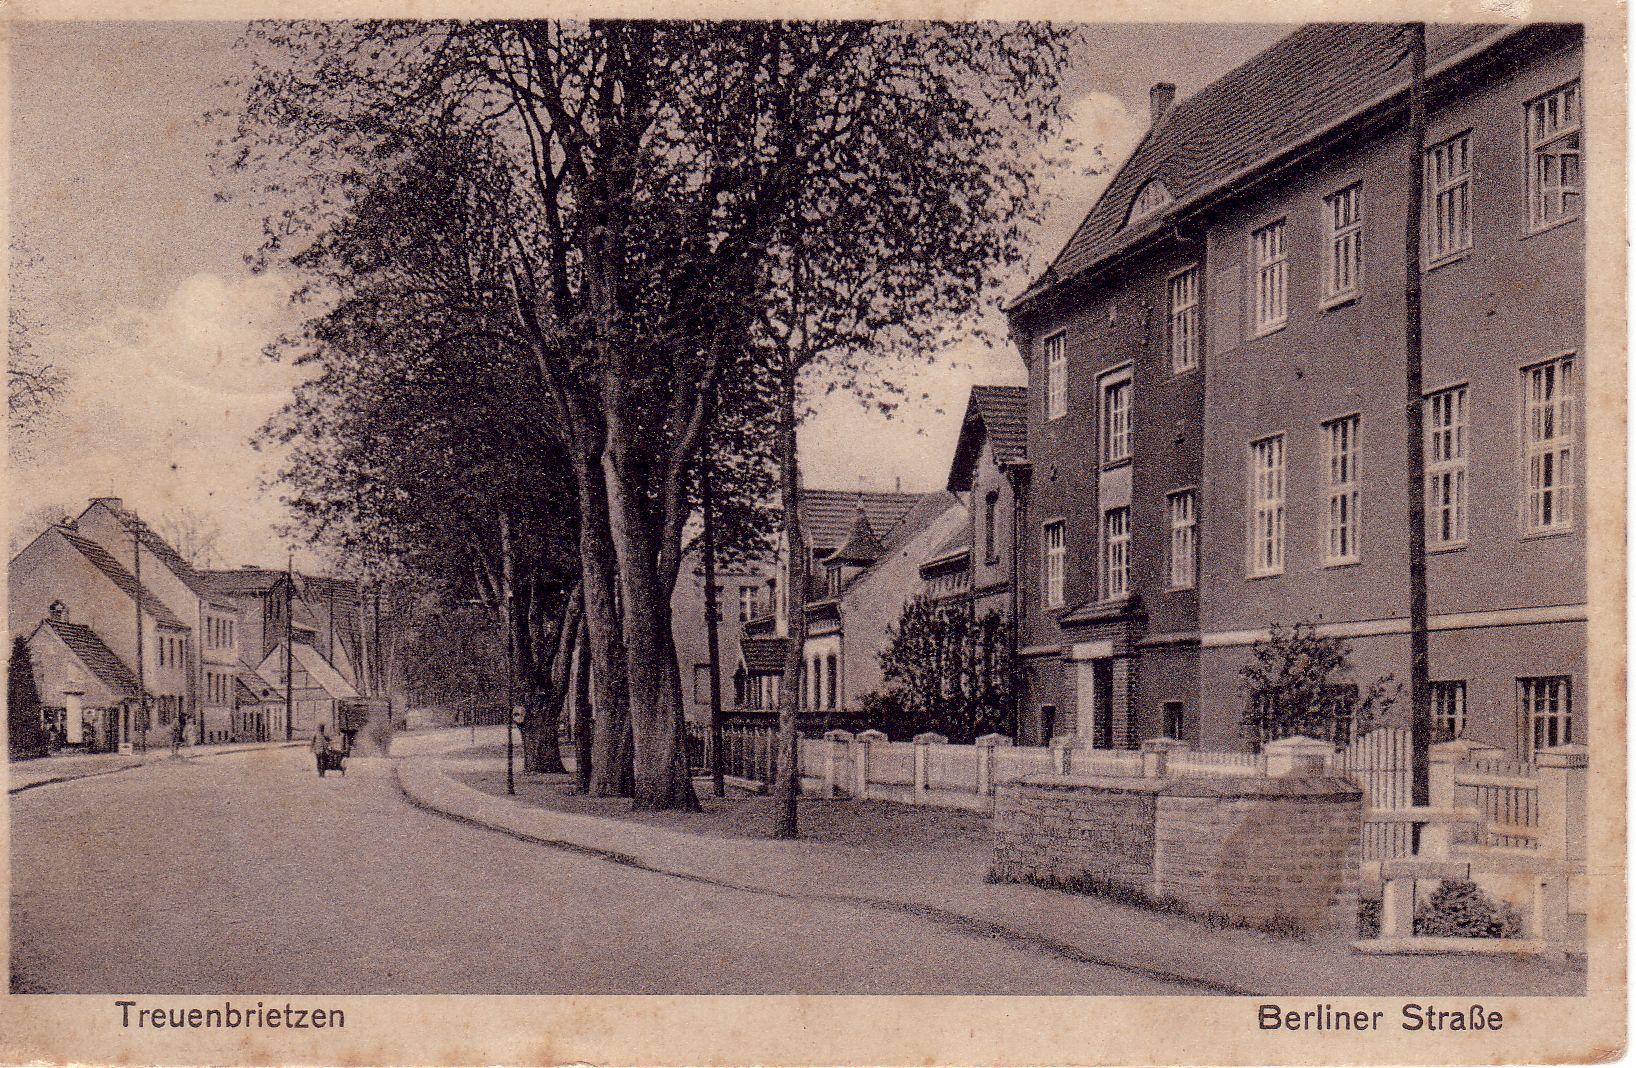 Berliner Straße 1935 Treuenbrietzen